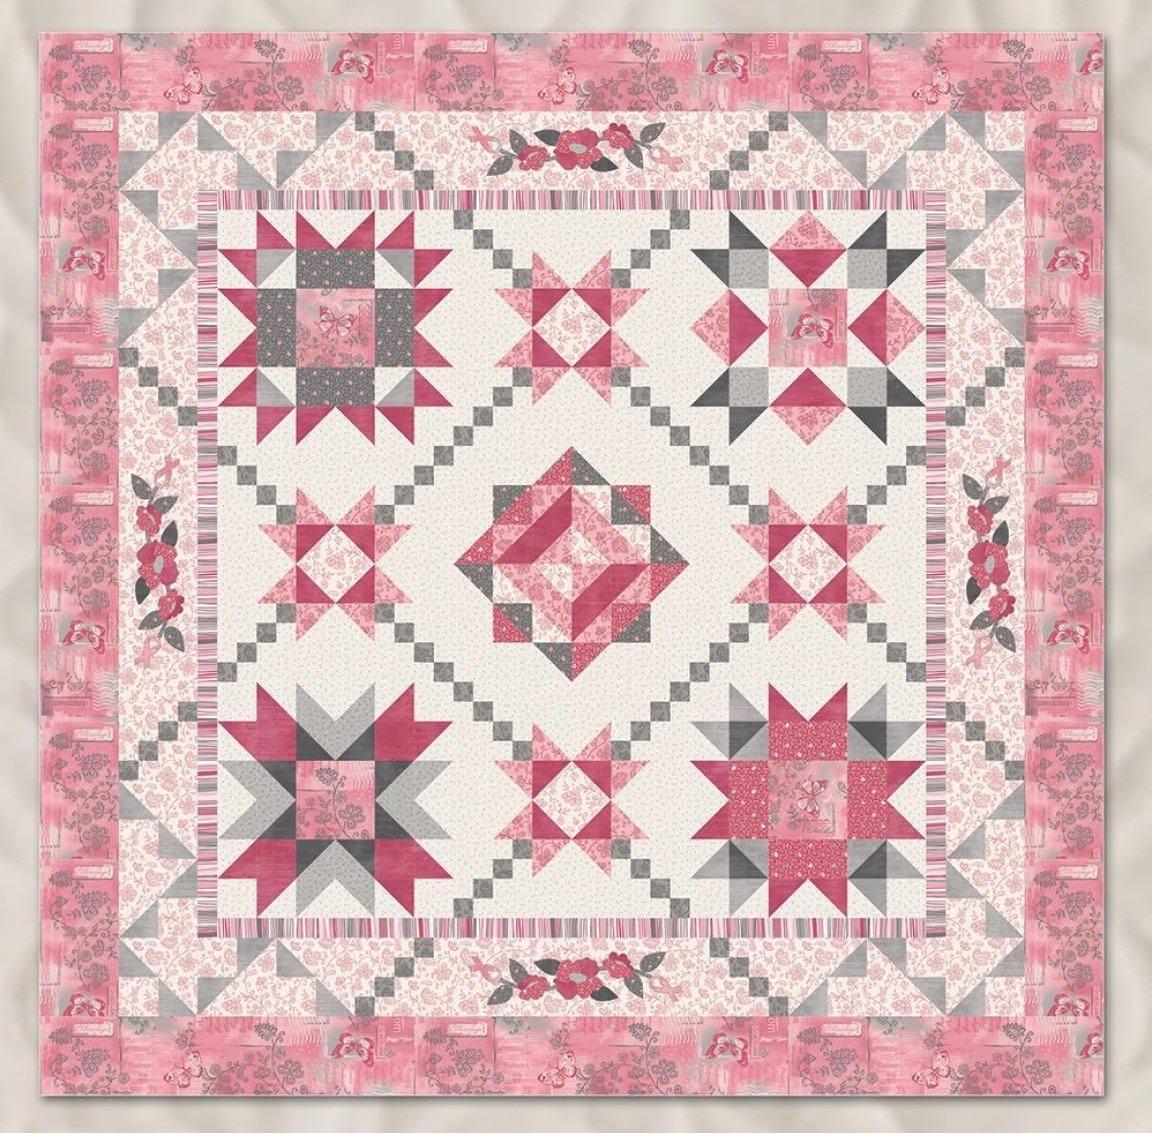 Soulful Pinks Bona Fide Kit Soulful Shades of Pink